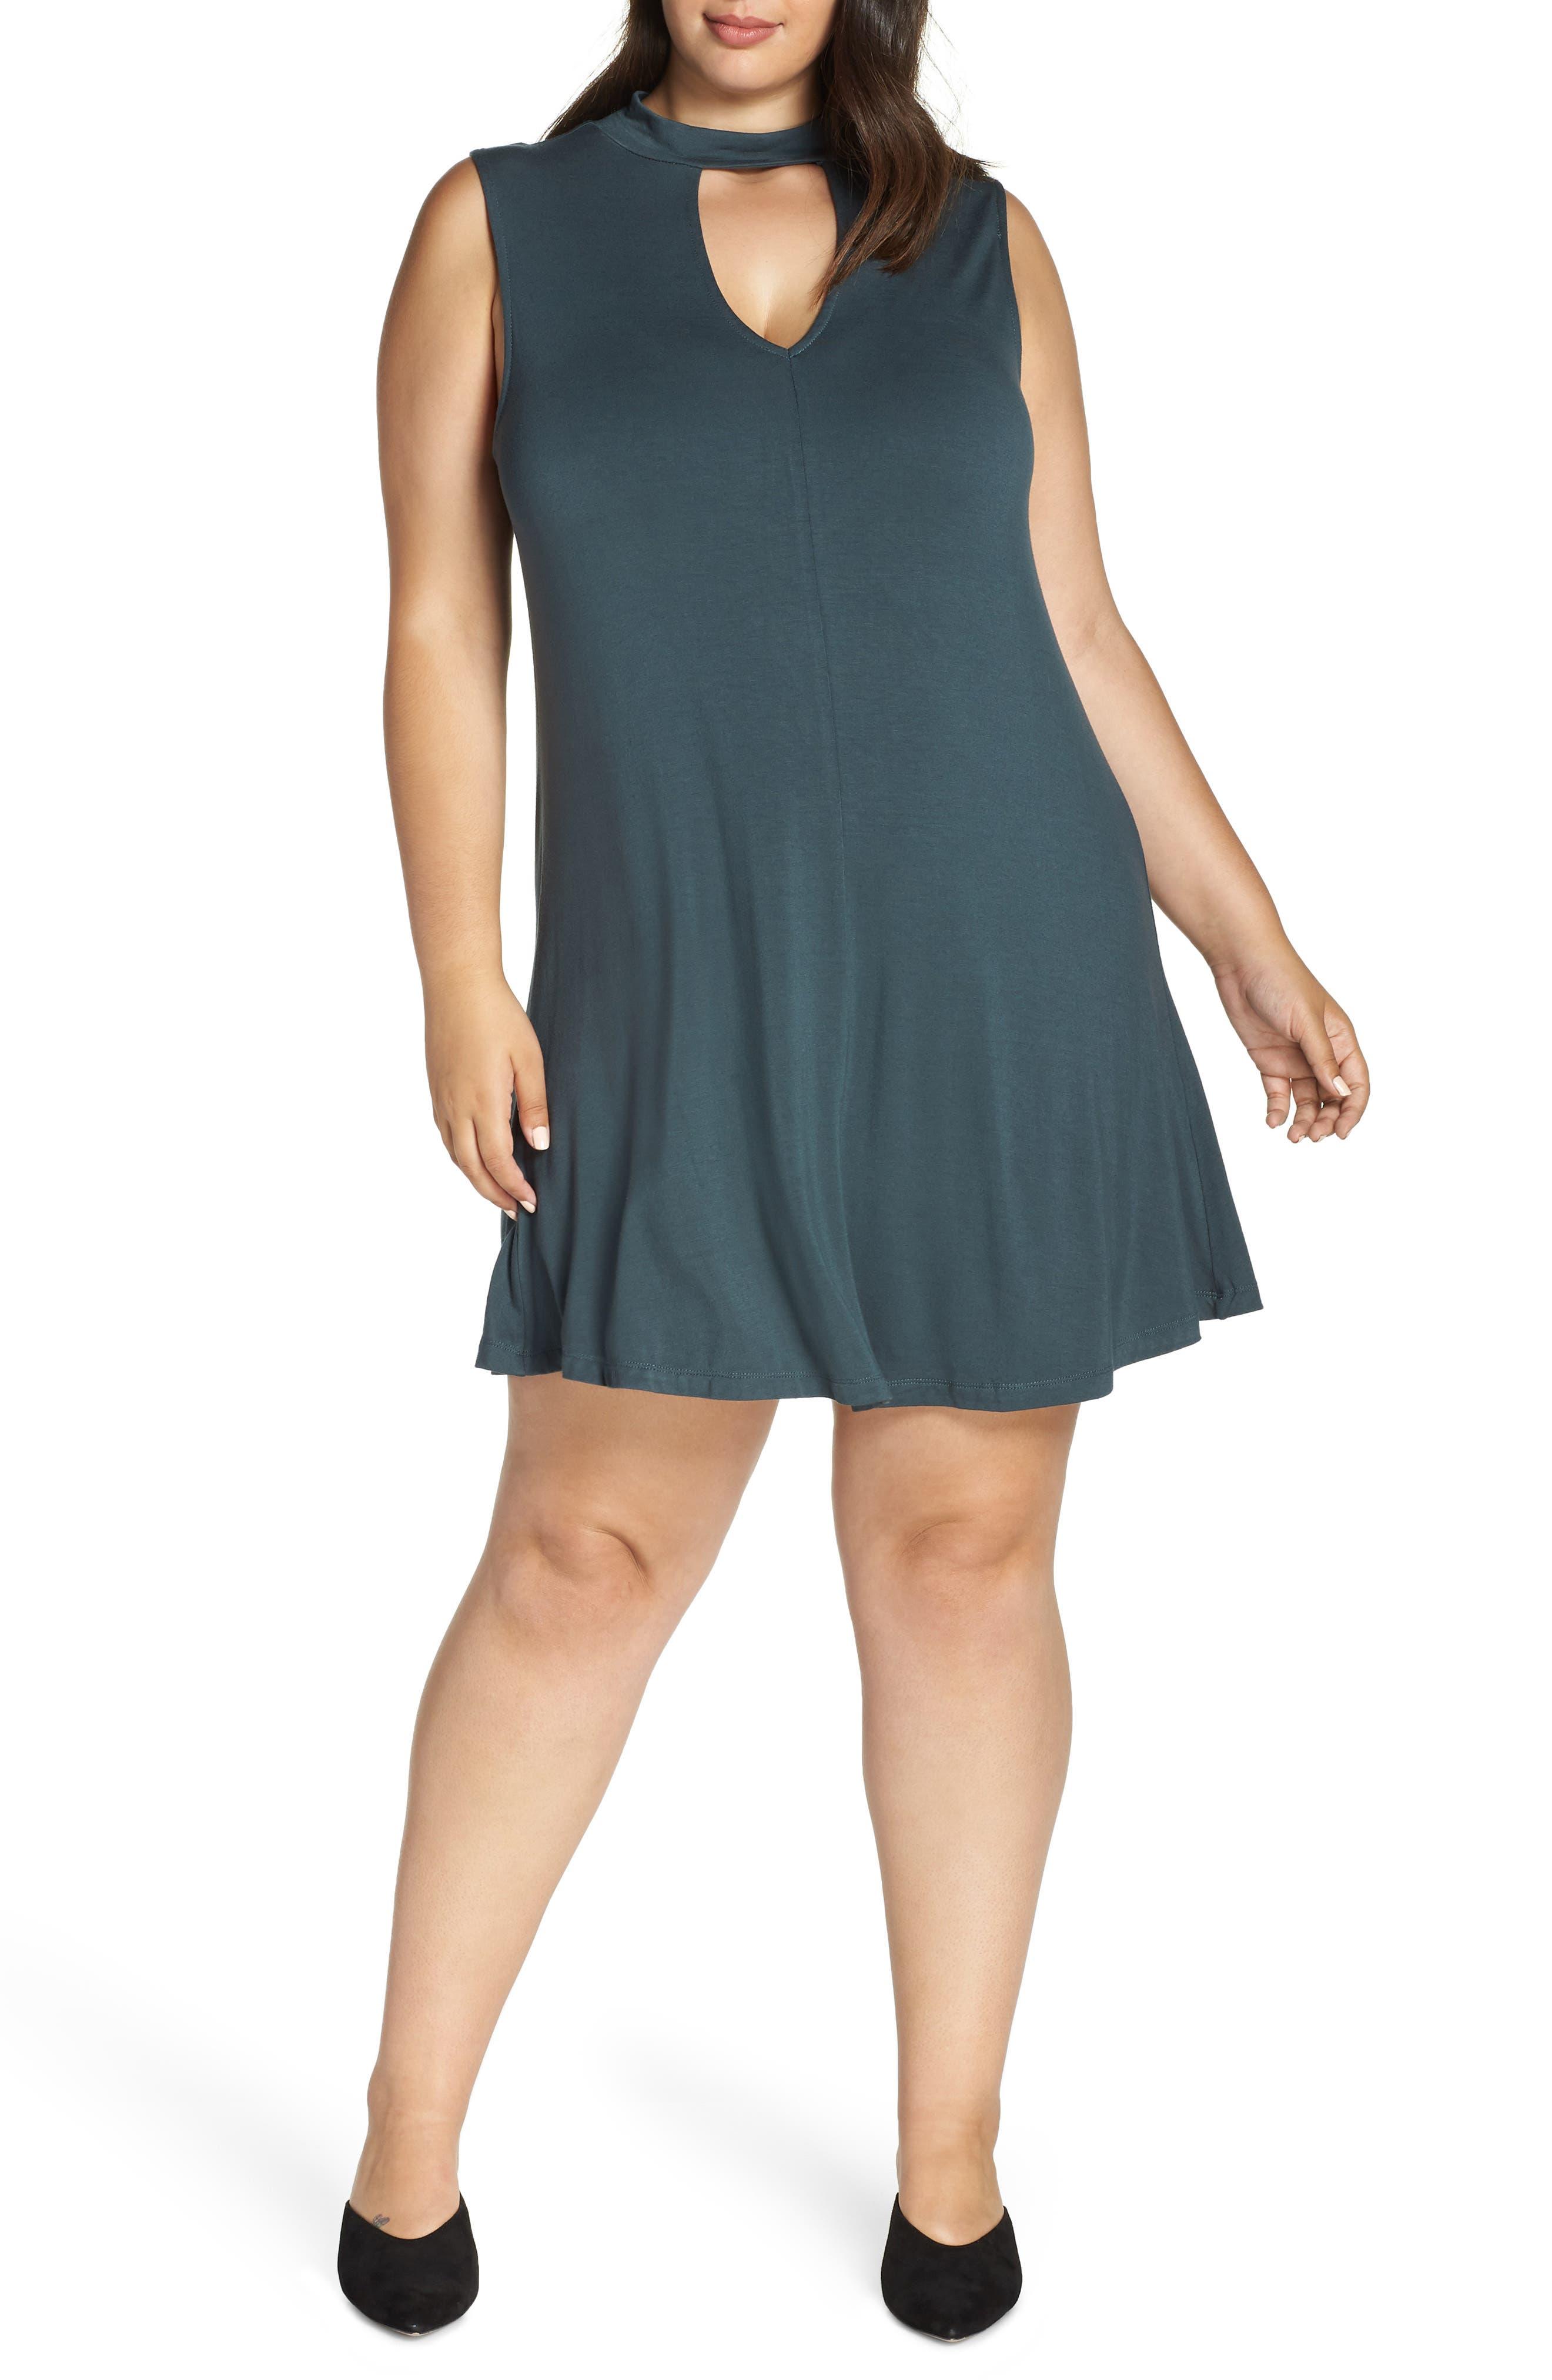 Plus Size Lemon Tart Esperanza Neck Keyhole Skater Dress, Green